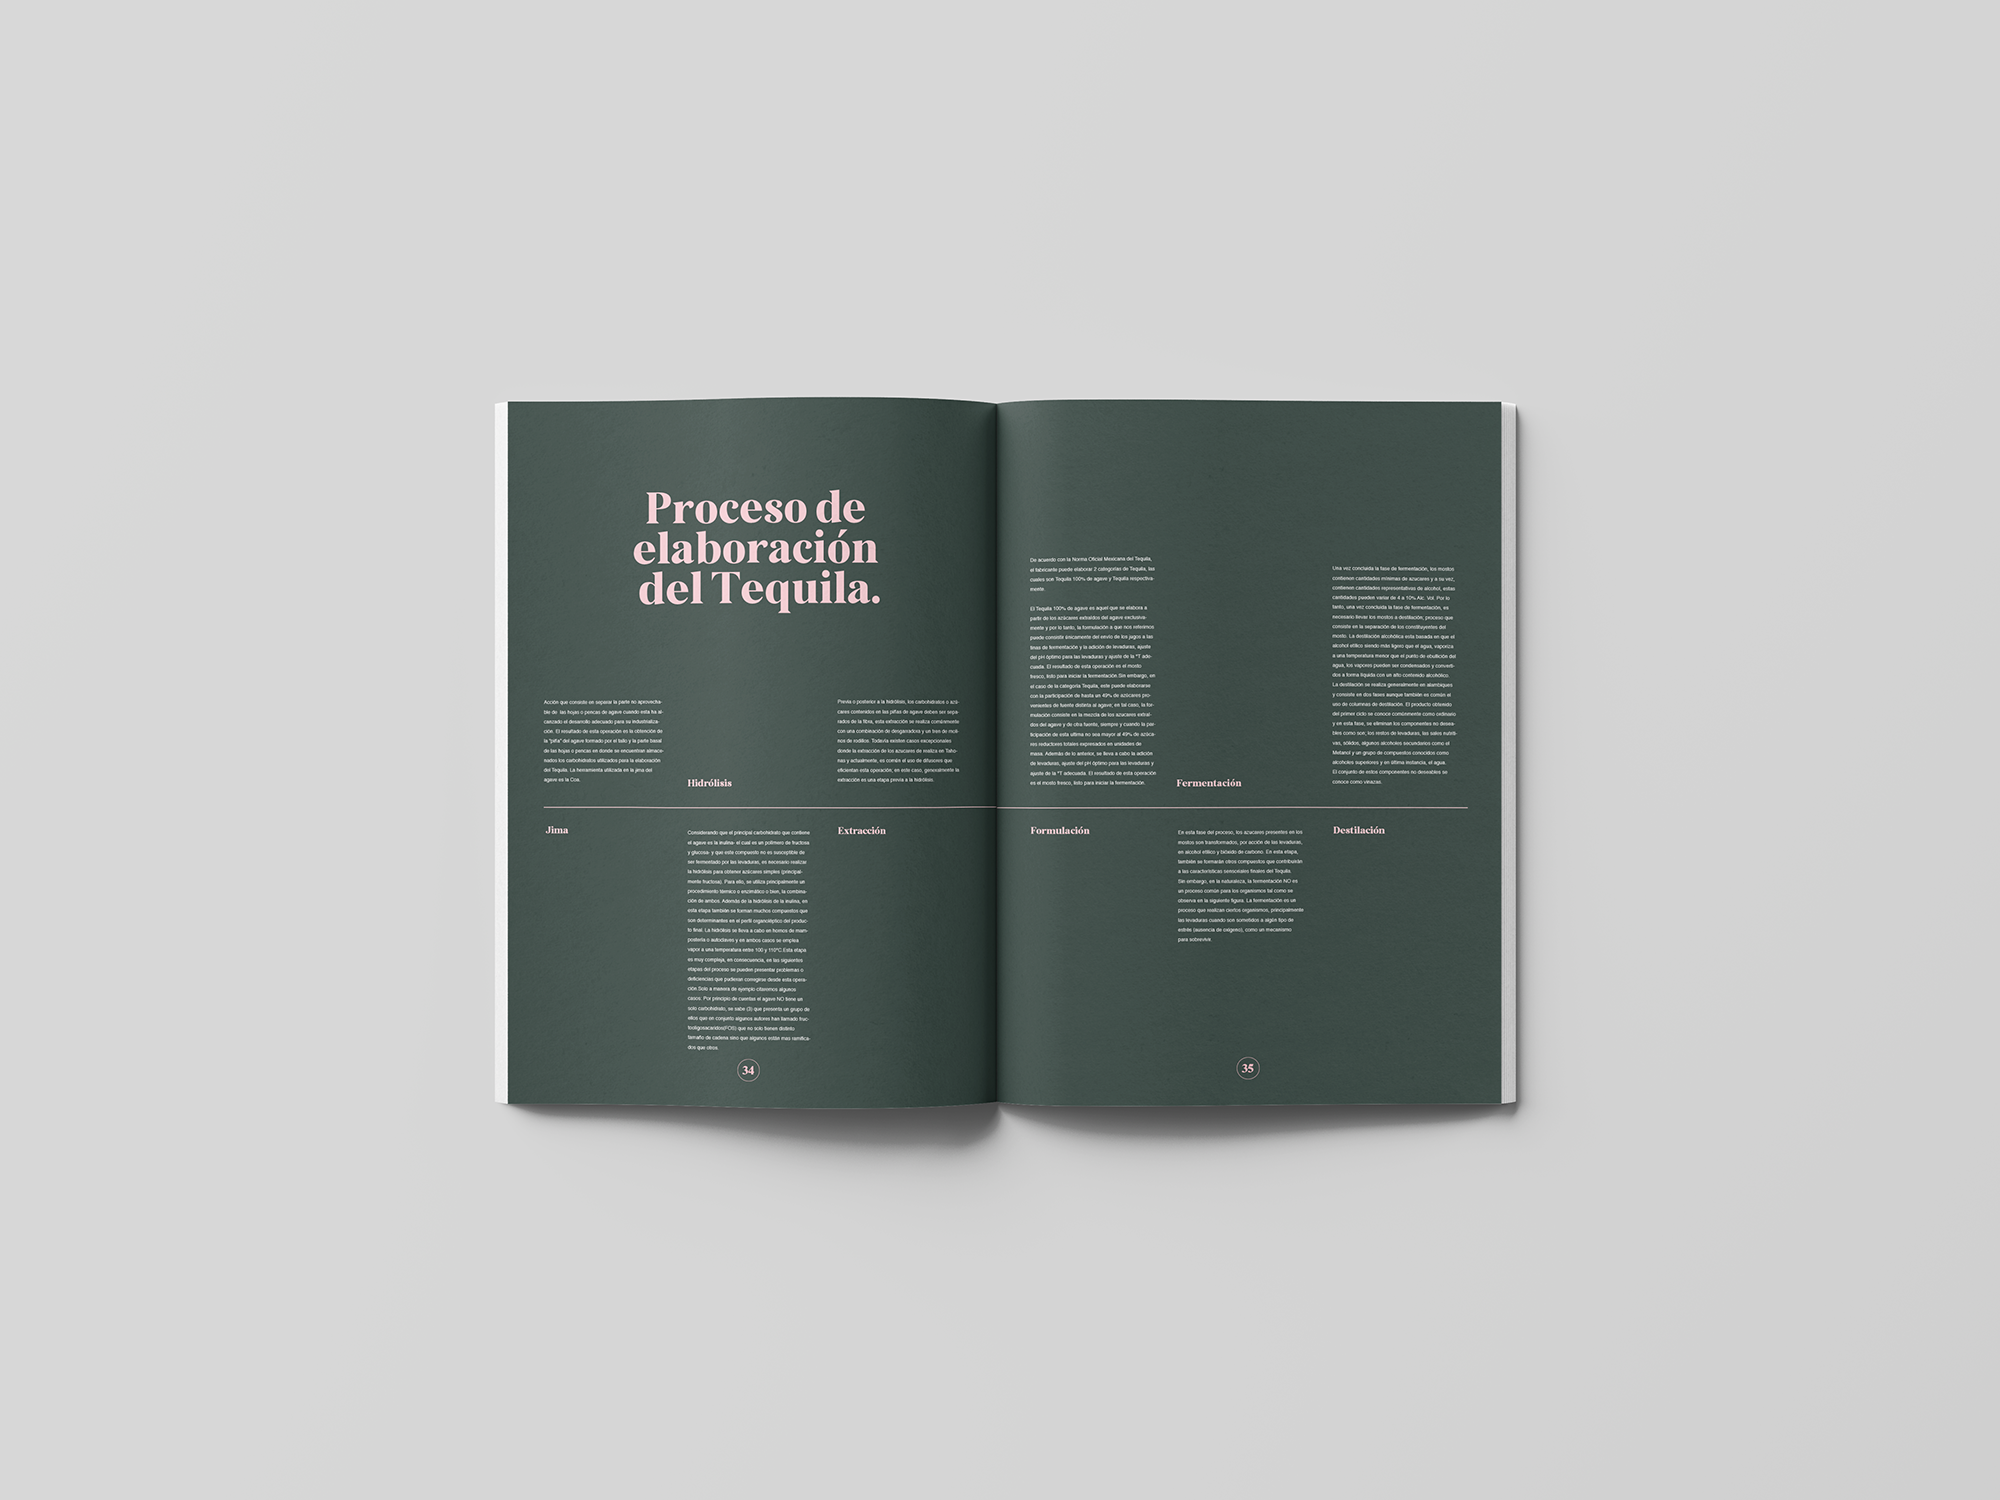 spread-11-book-agave-yoenpaperland